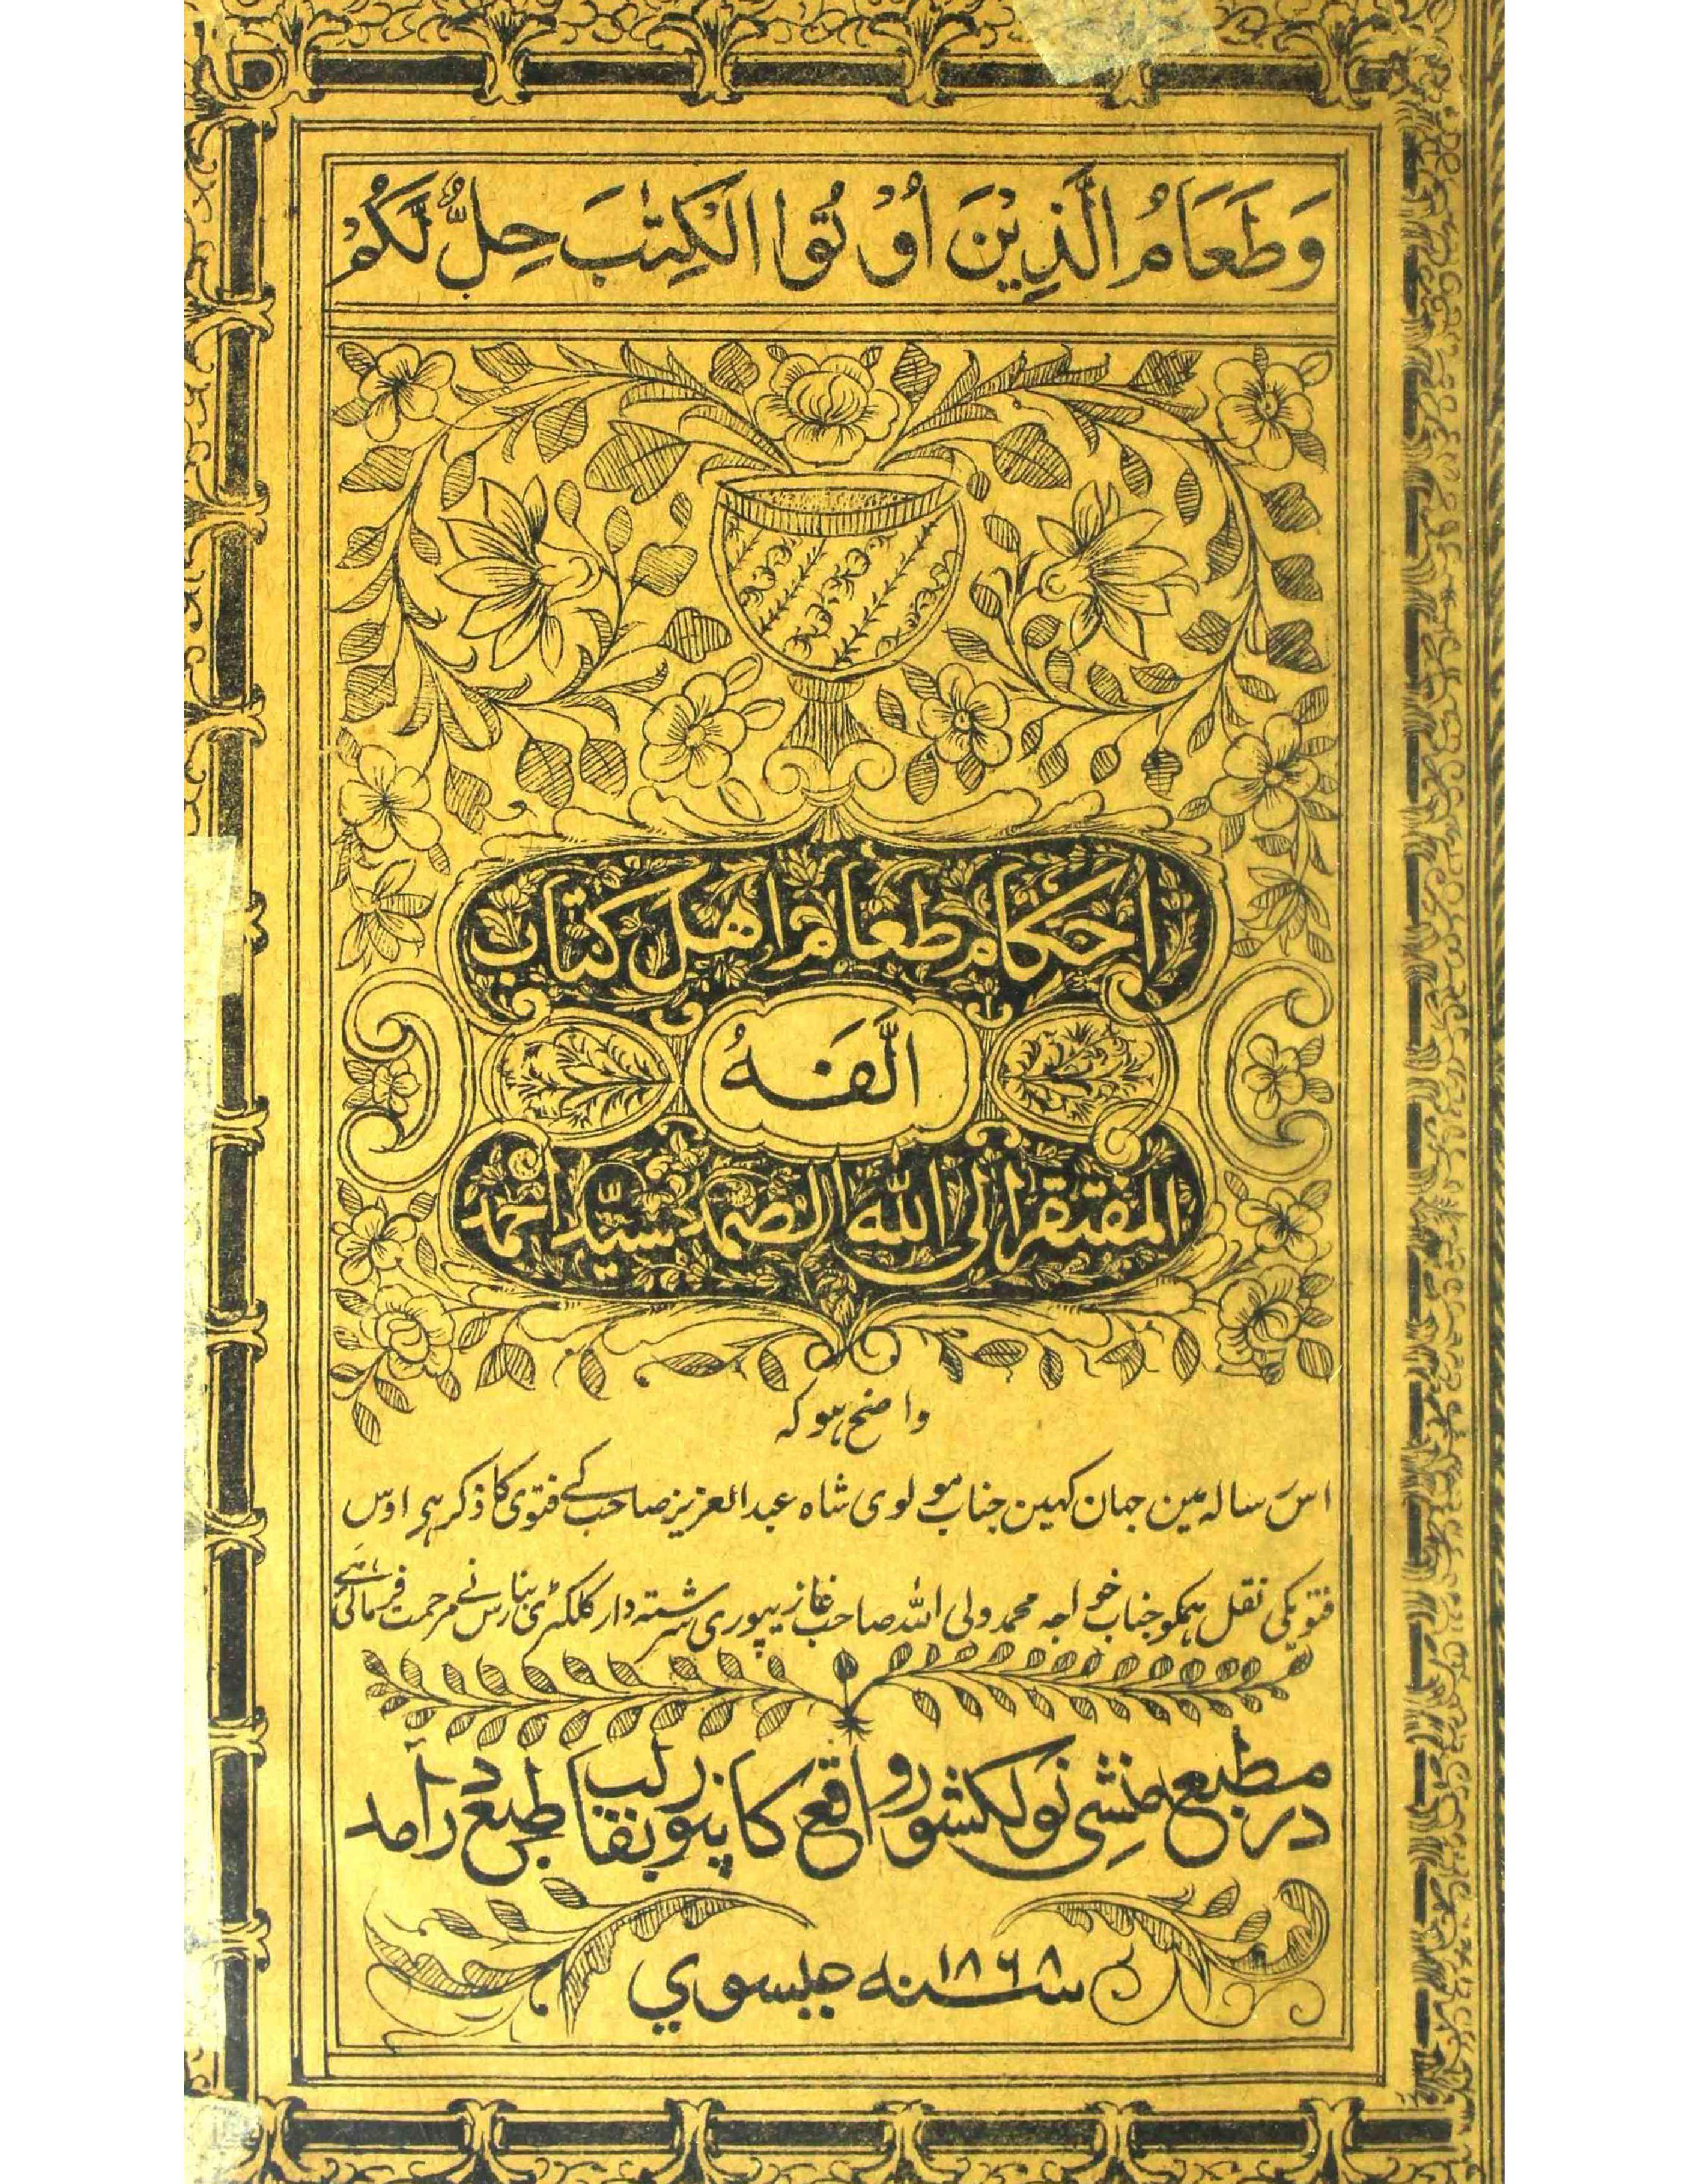 Ahkam-e-Taam-e-Ahl-e-Kitab